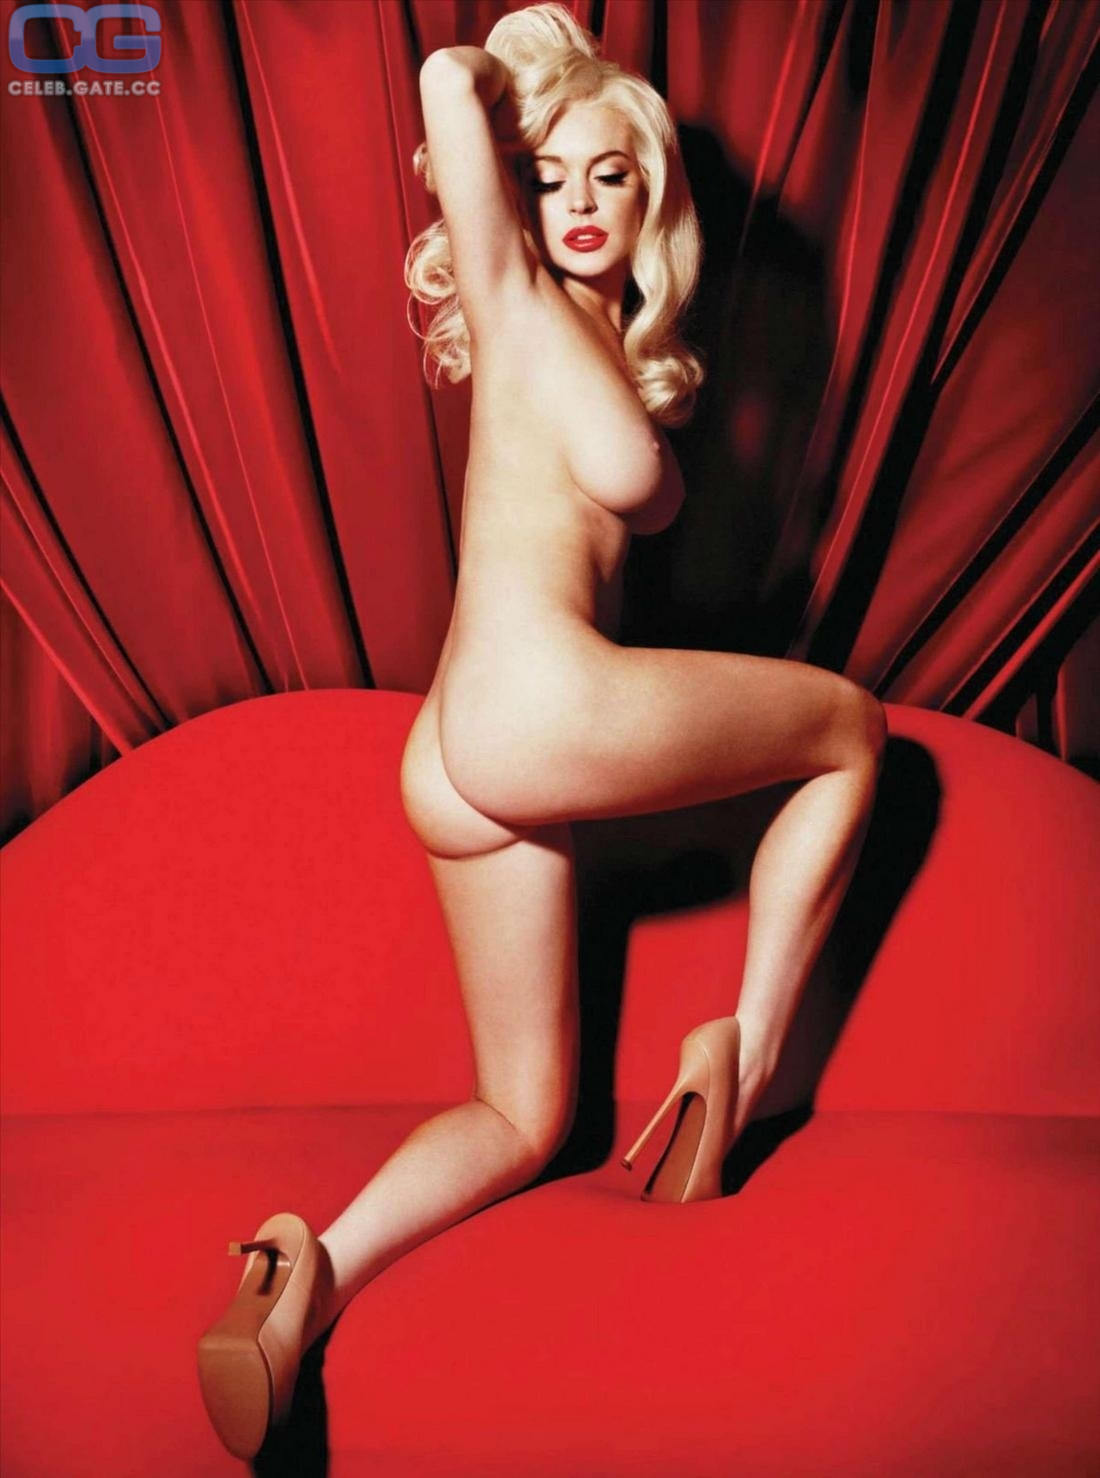 Nacktbilder lindsay lohan dina lohan